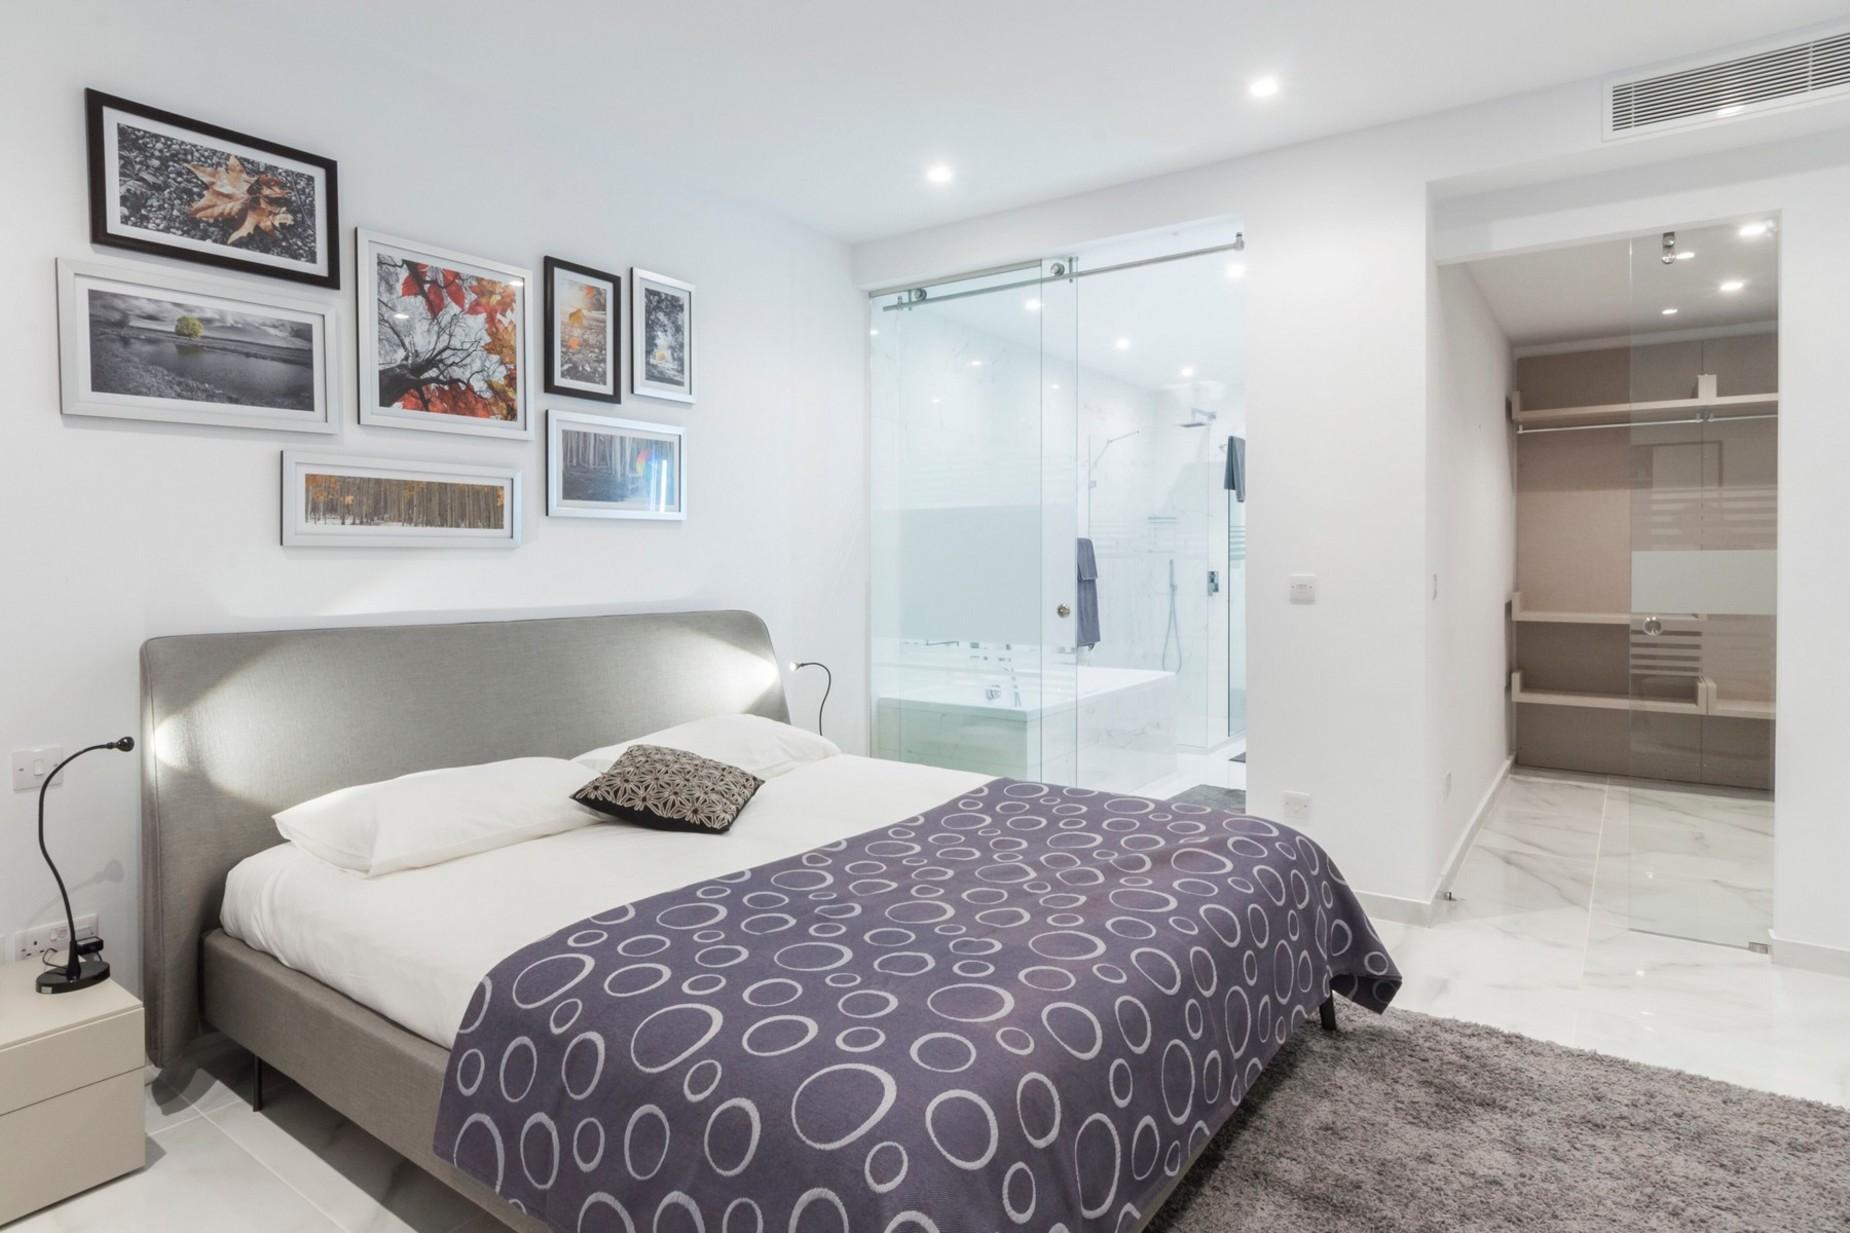 0 bed Apartment For Rent in Sliema, Sliema - thumb 9